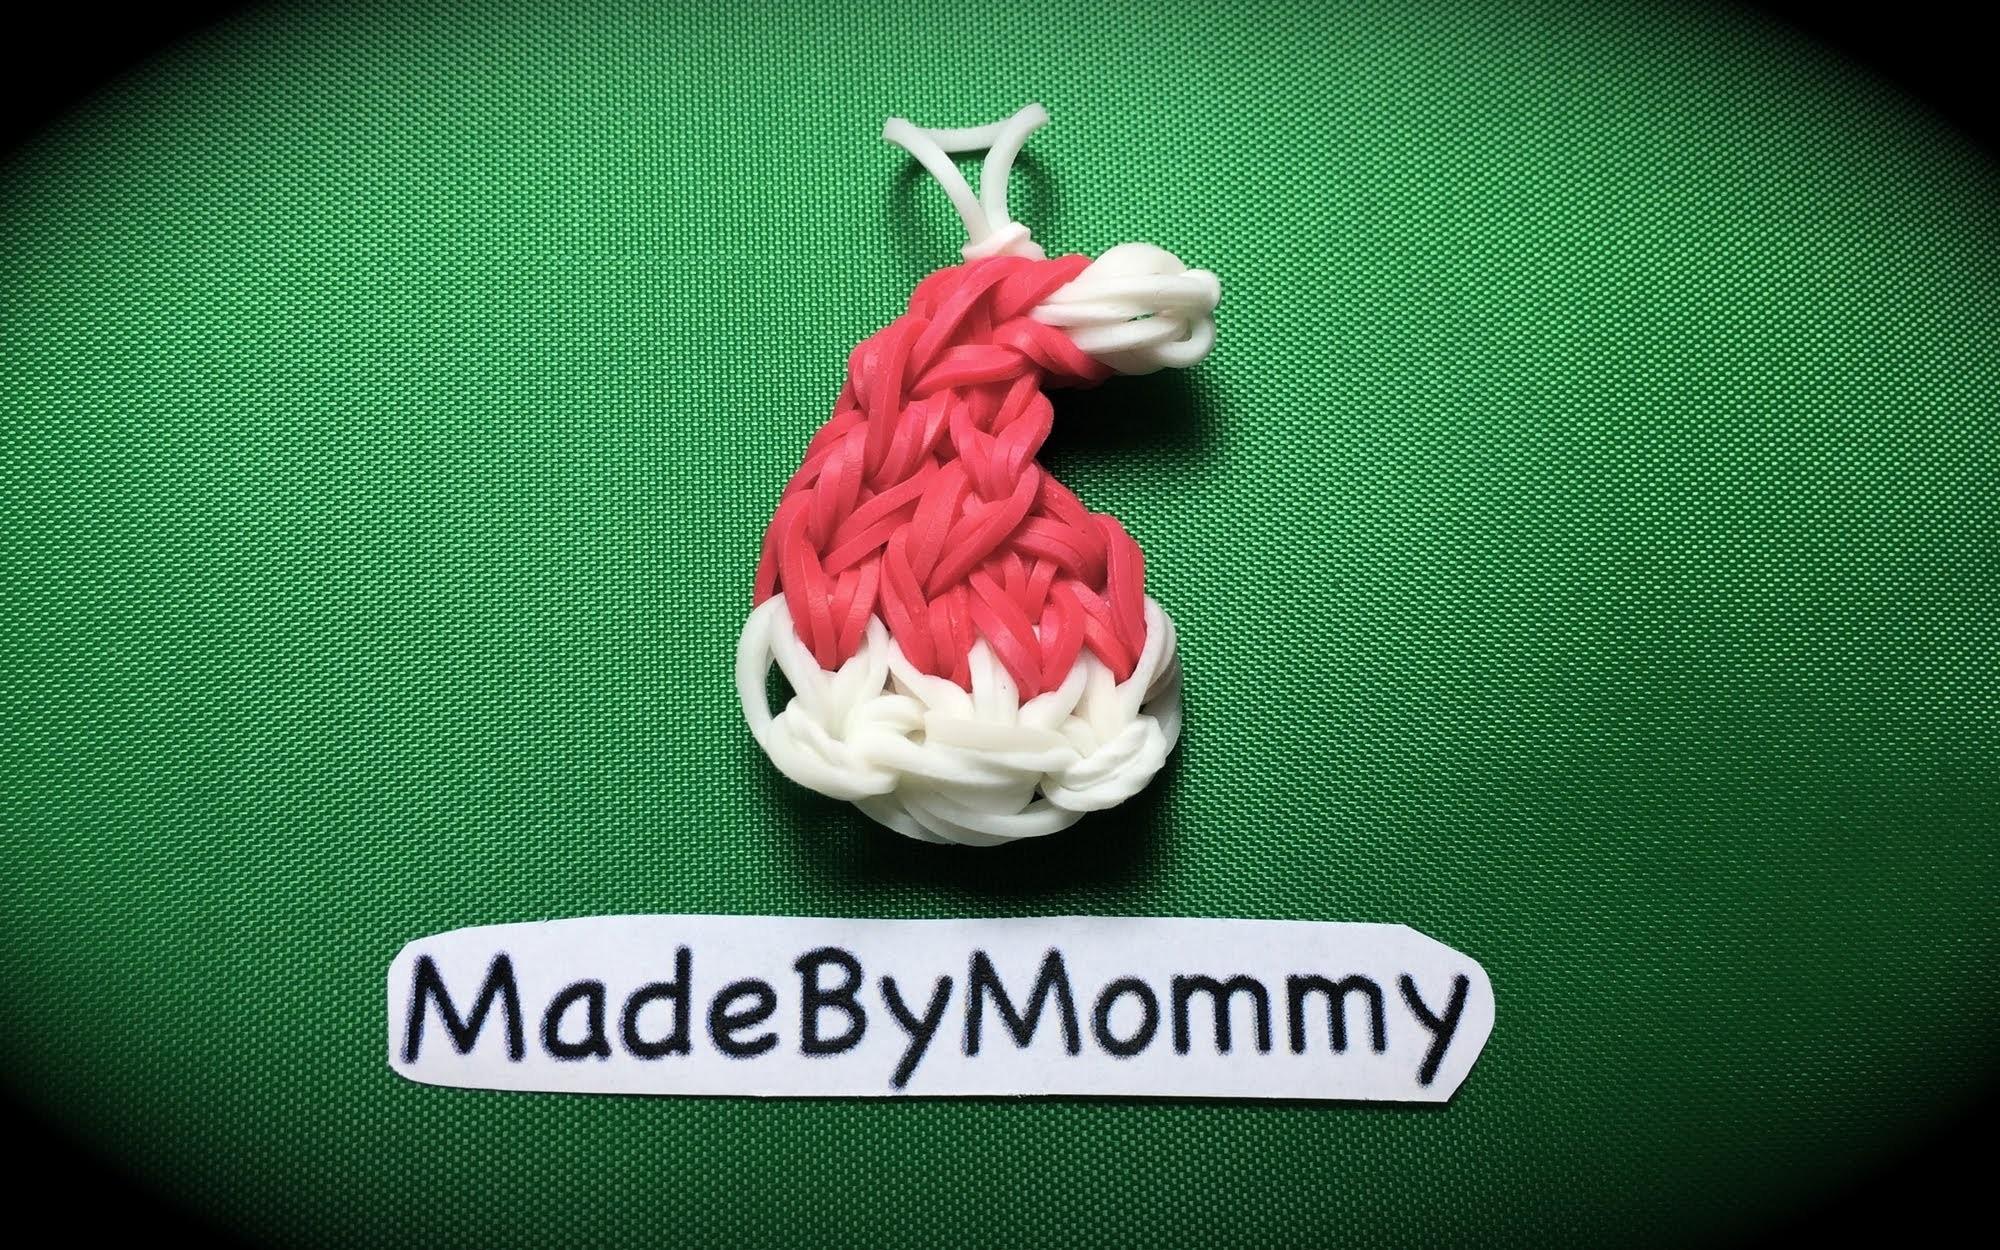 Made by Mommy's Santa Hat Charm on the Rainbow Loom